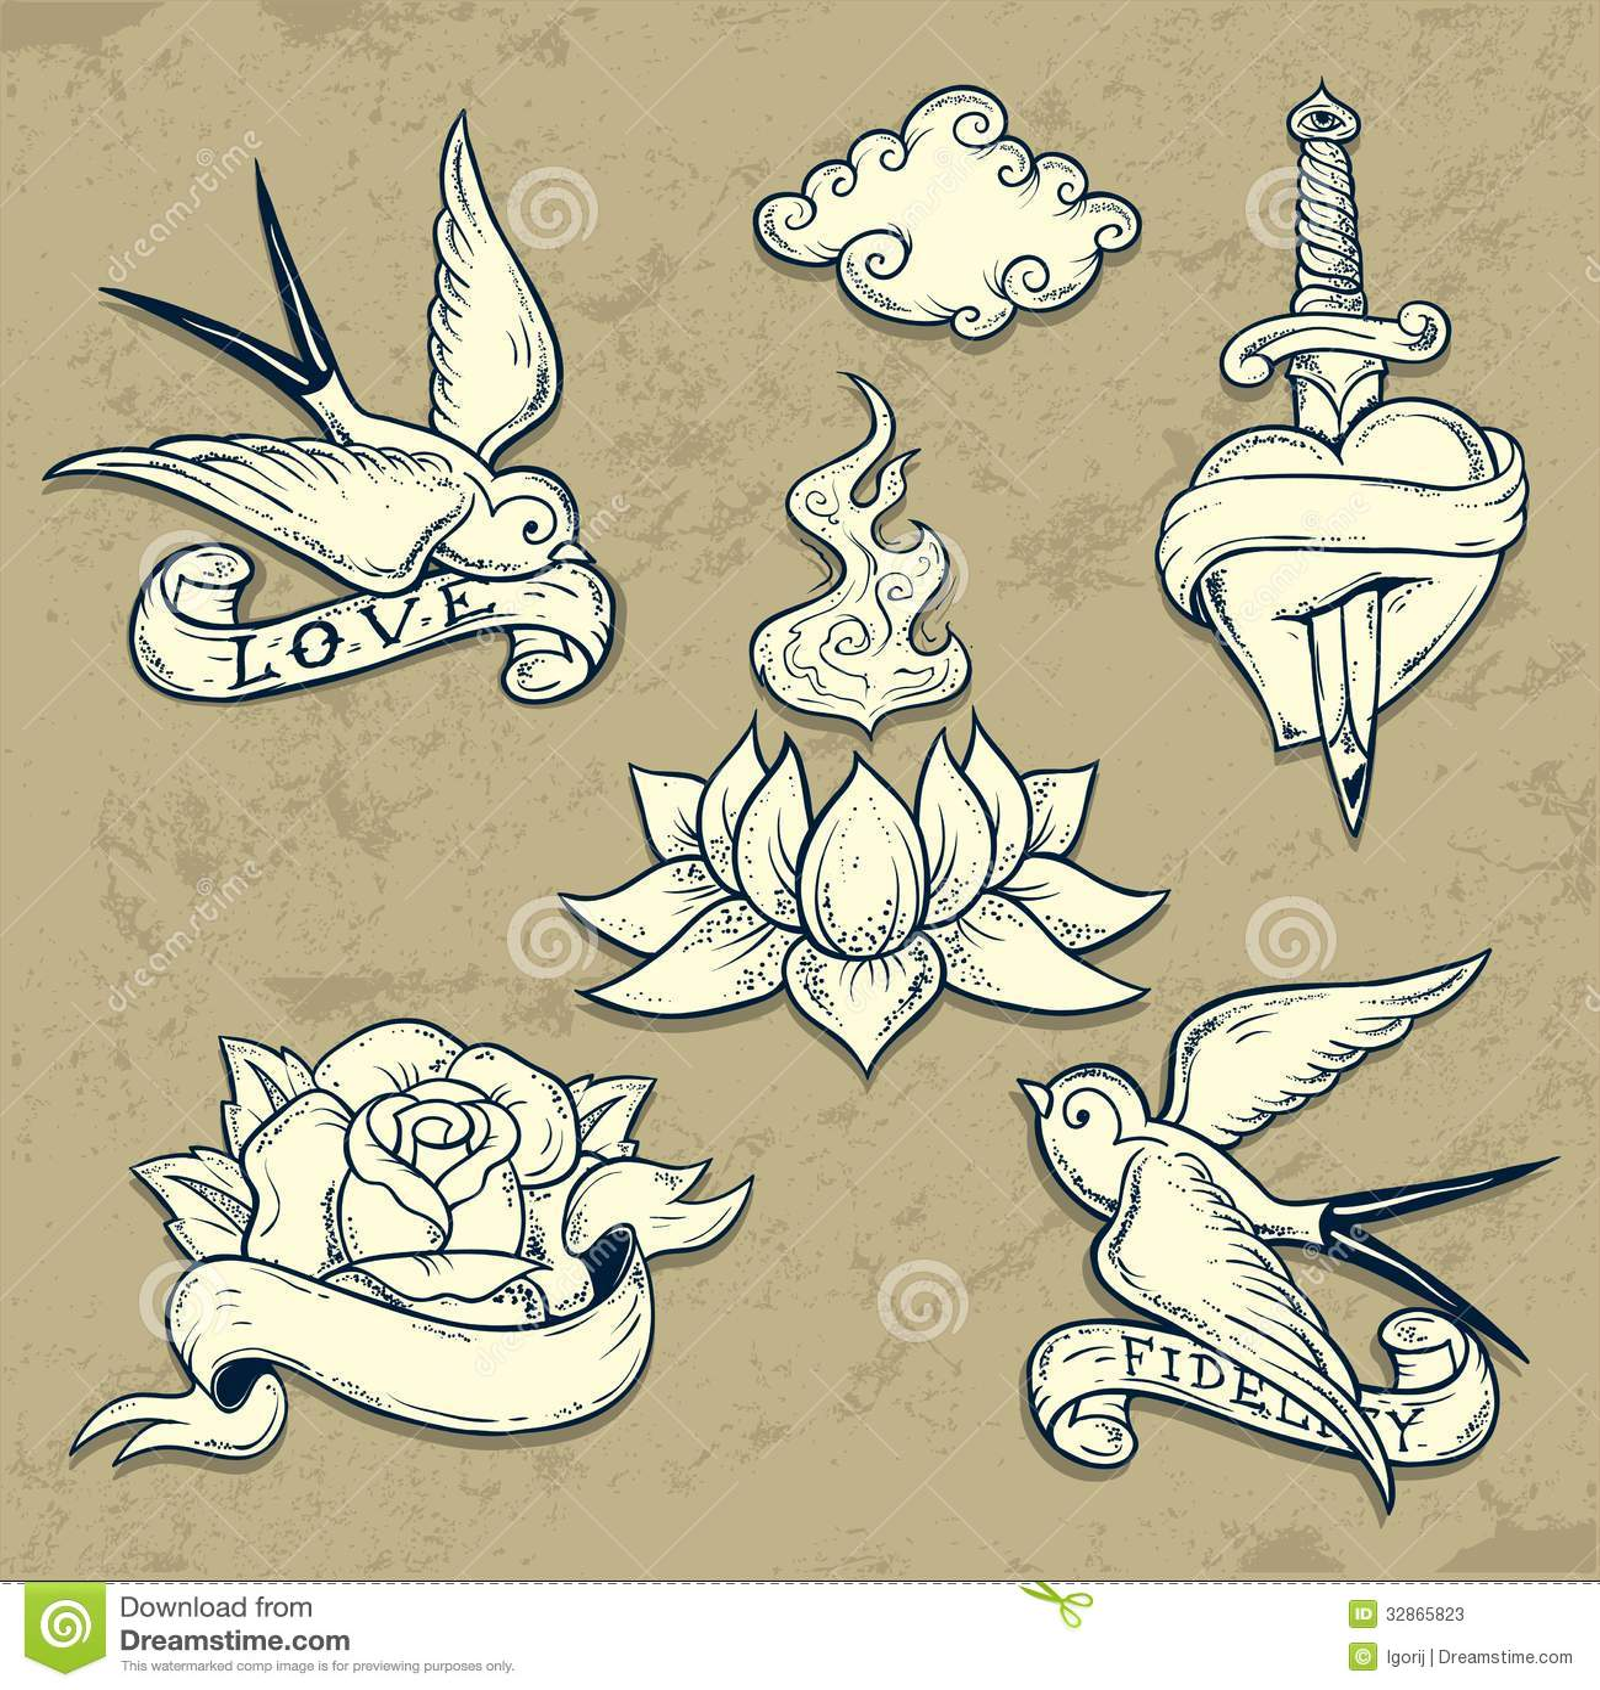 old school symbols